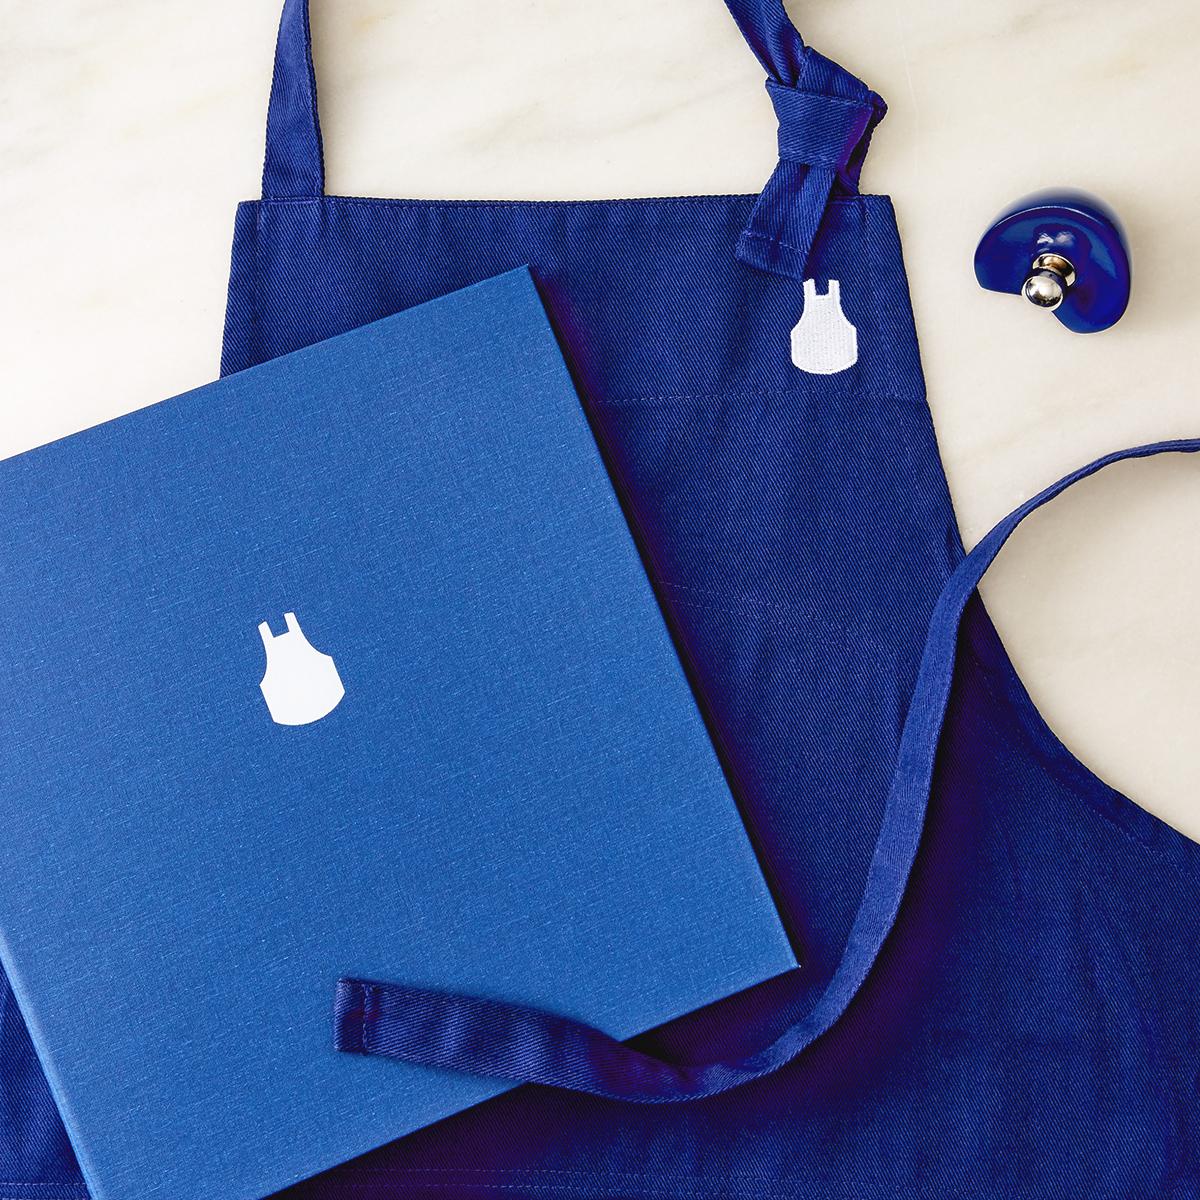 Blue apron llc - Check Out The Blue Apron Set Now Available At Blue Apron Market Https